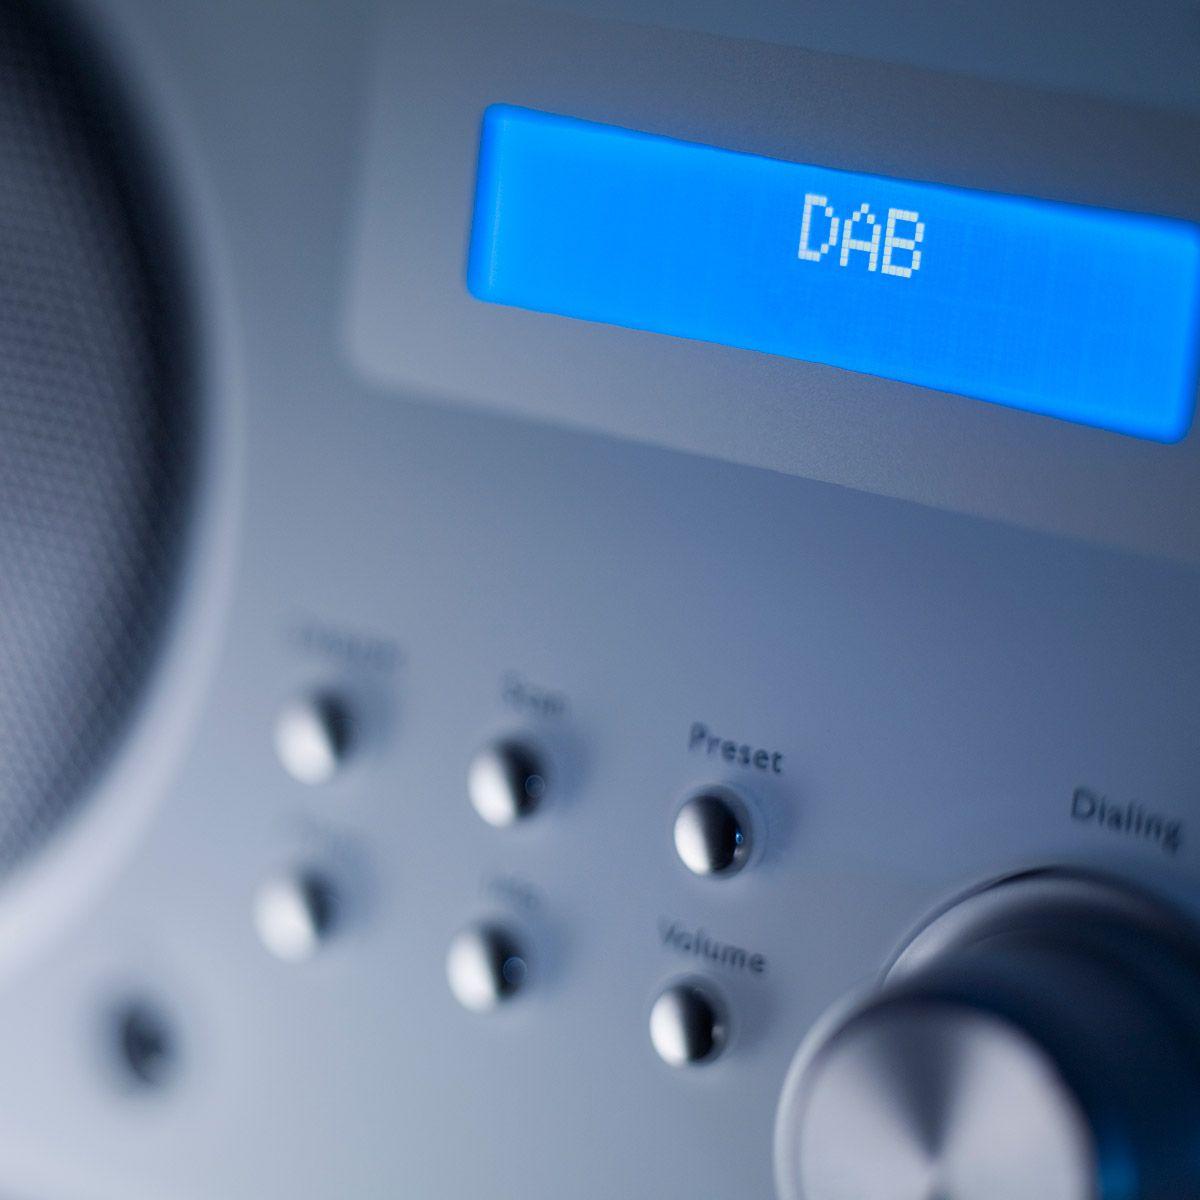 DAB radio buying guide